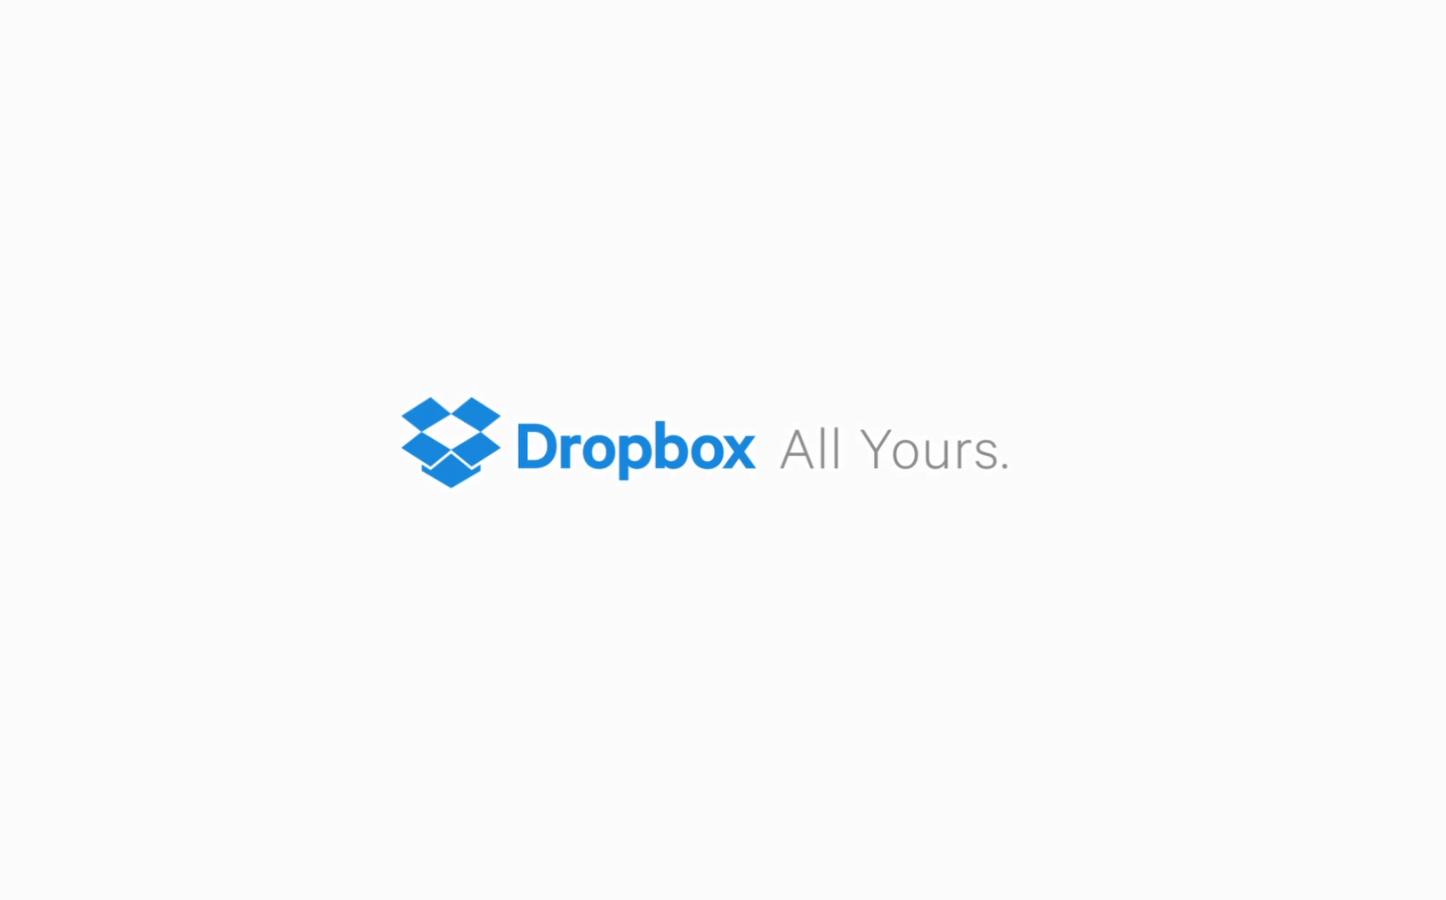 Dropbox New Logo